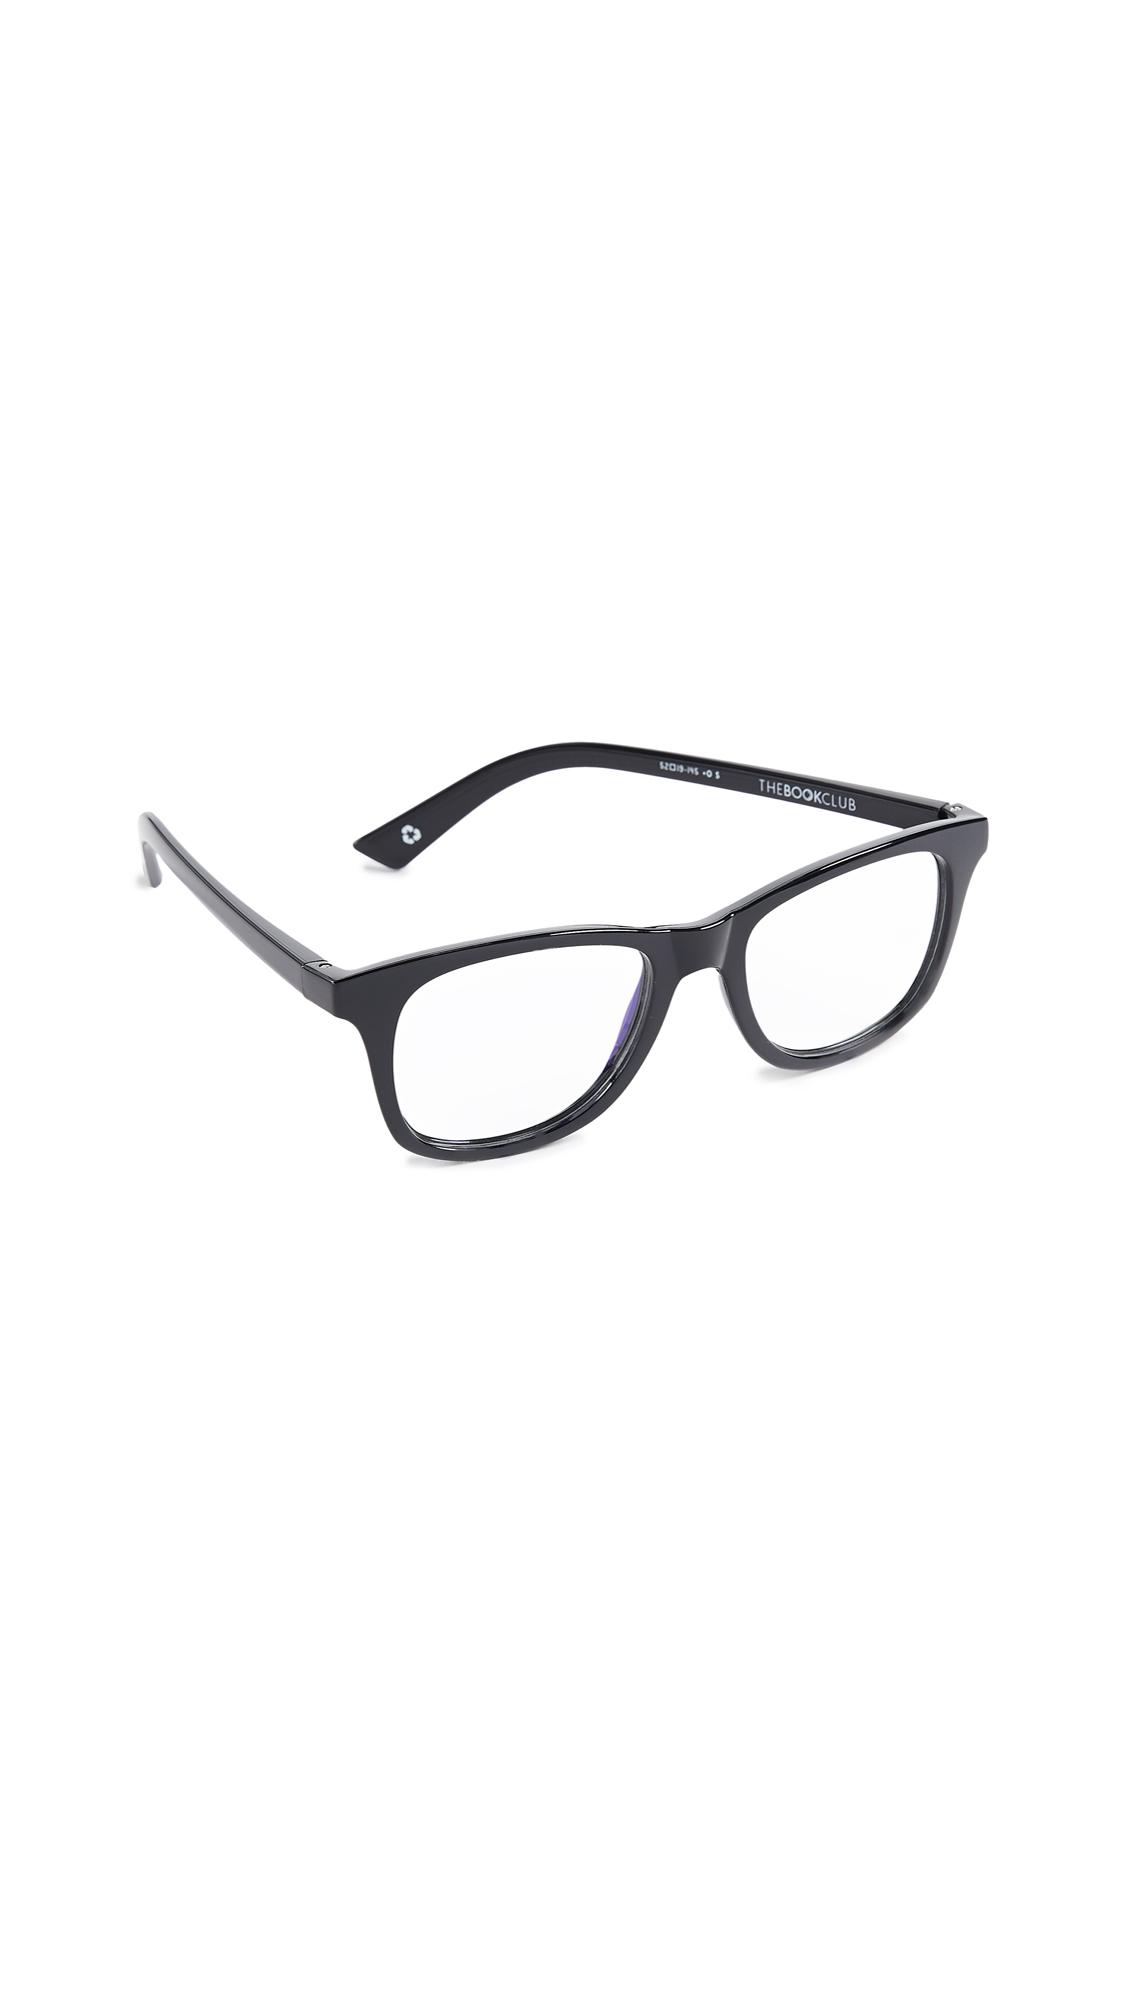 THE BOOK CLUB Grime In Banishment Glasses in Black